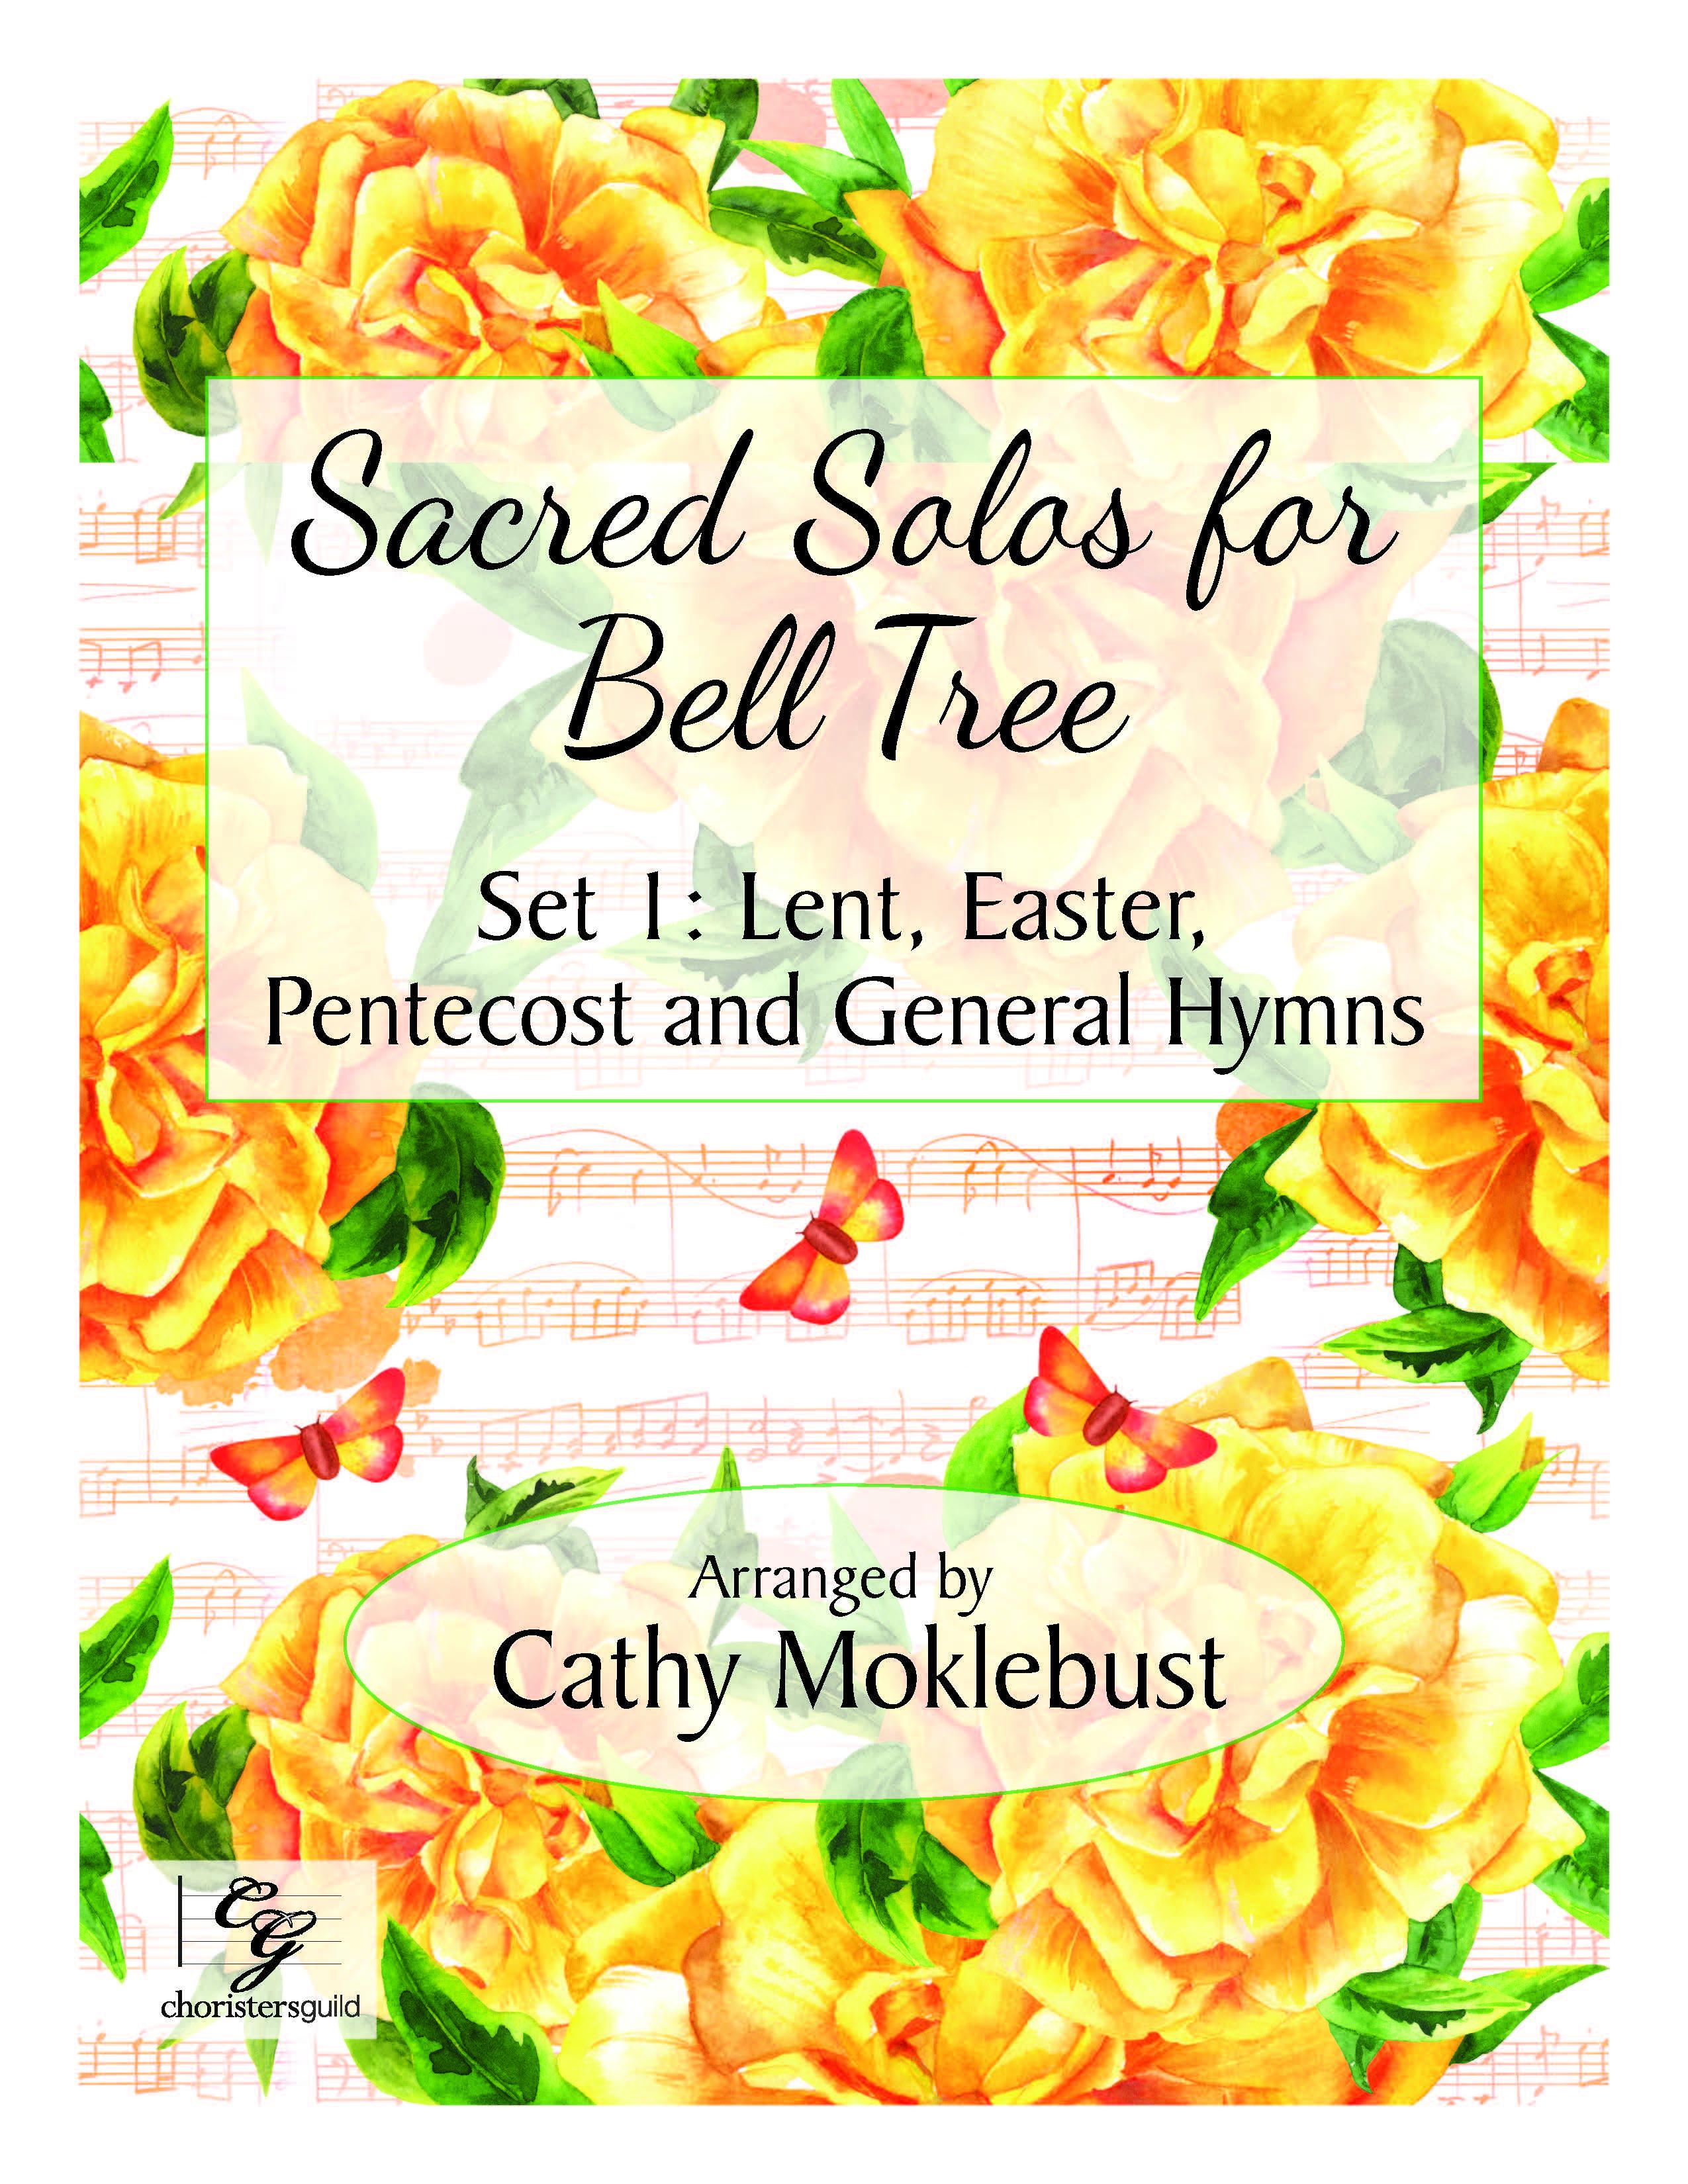 Sacred Solos for Bell Tree, Set 1 - Solo Handbells